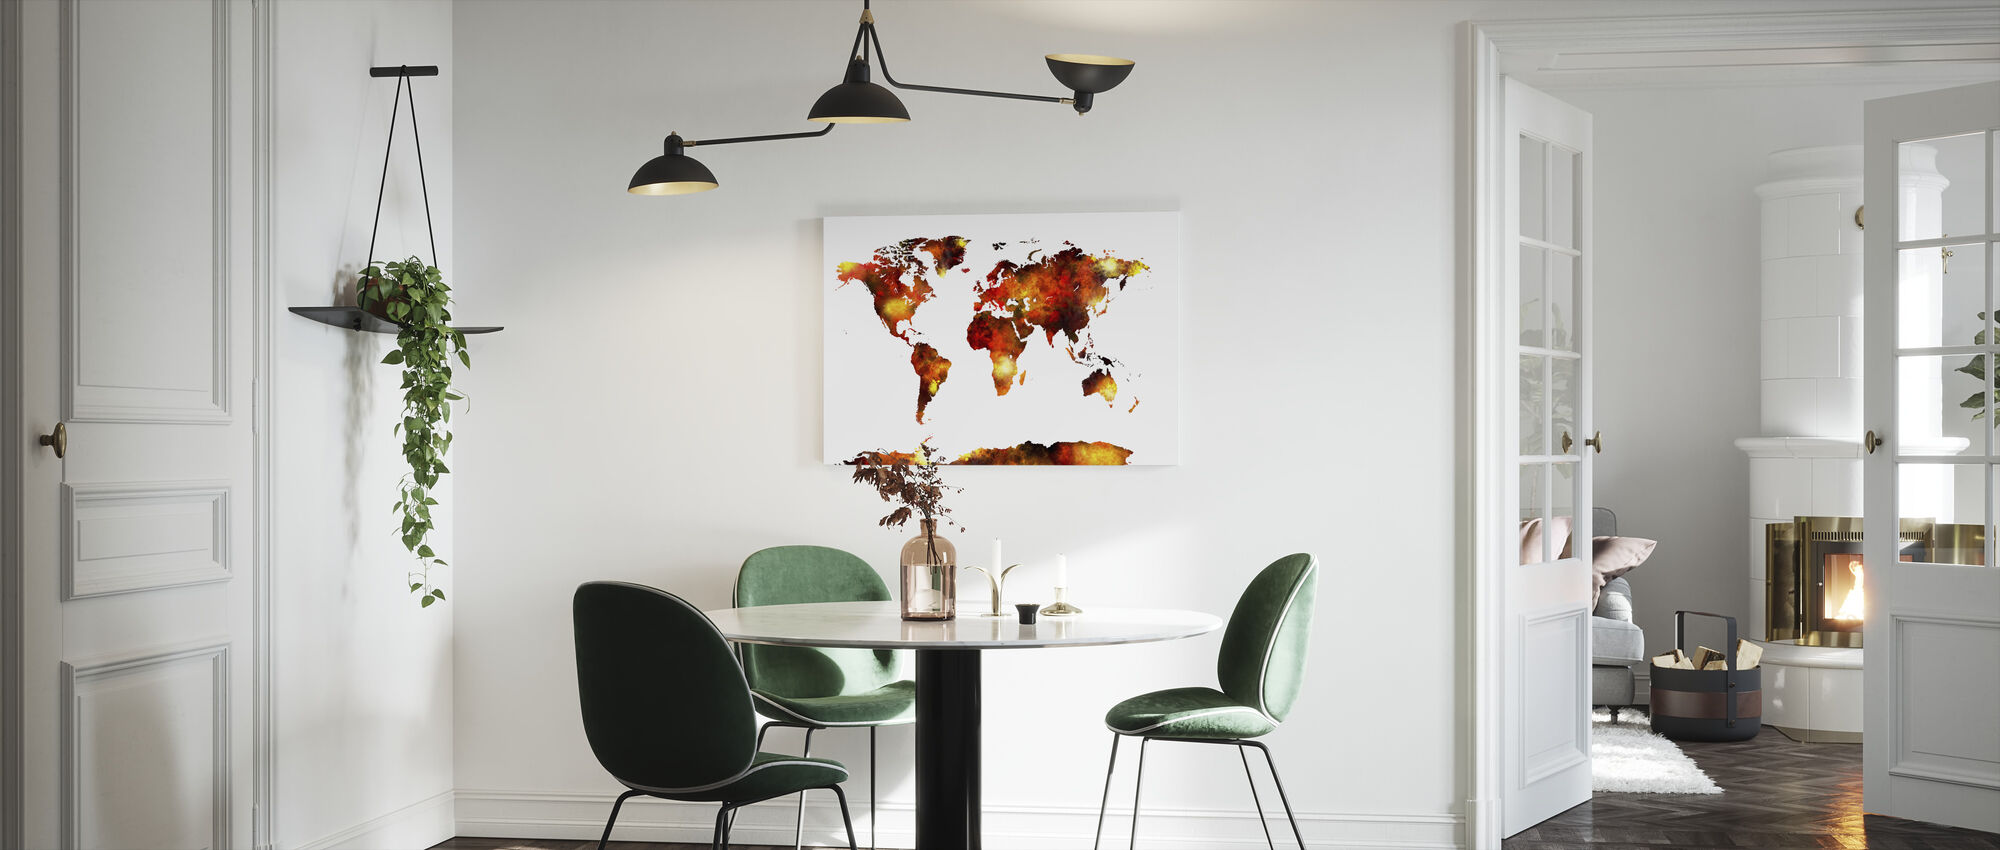 Watercolour World Map Orange - Canvas print - Kitchen